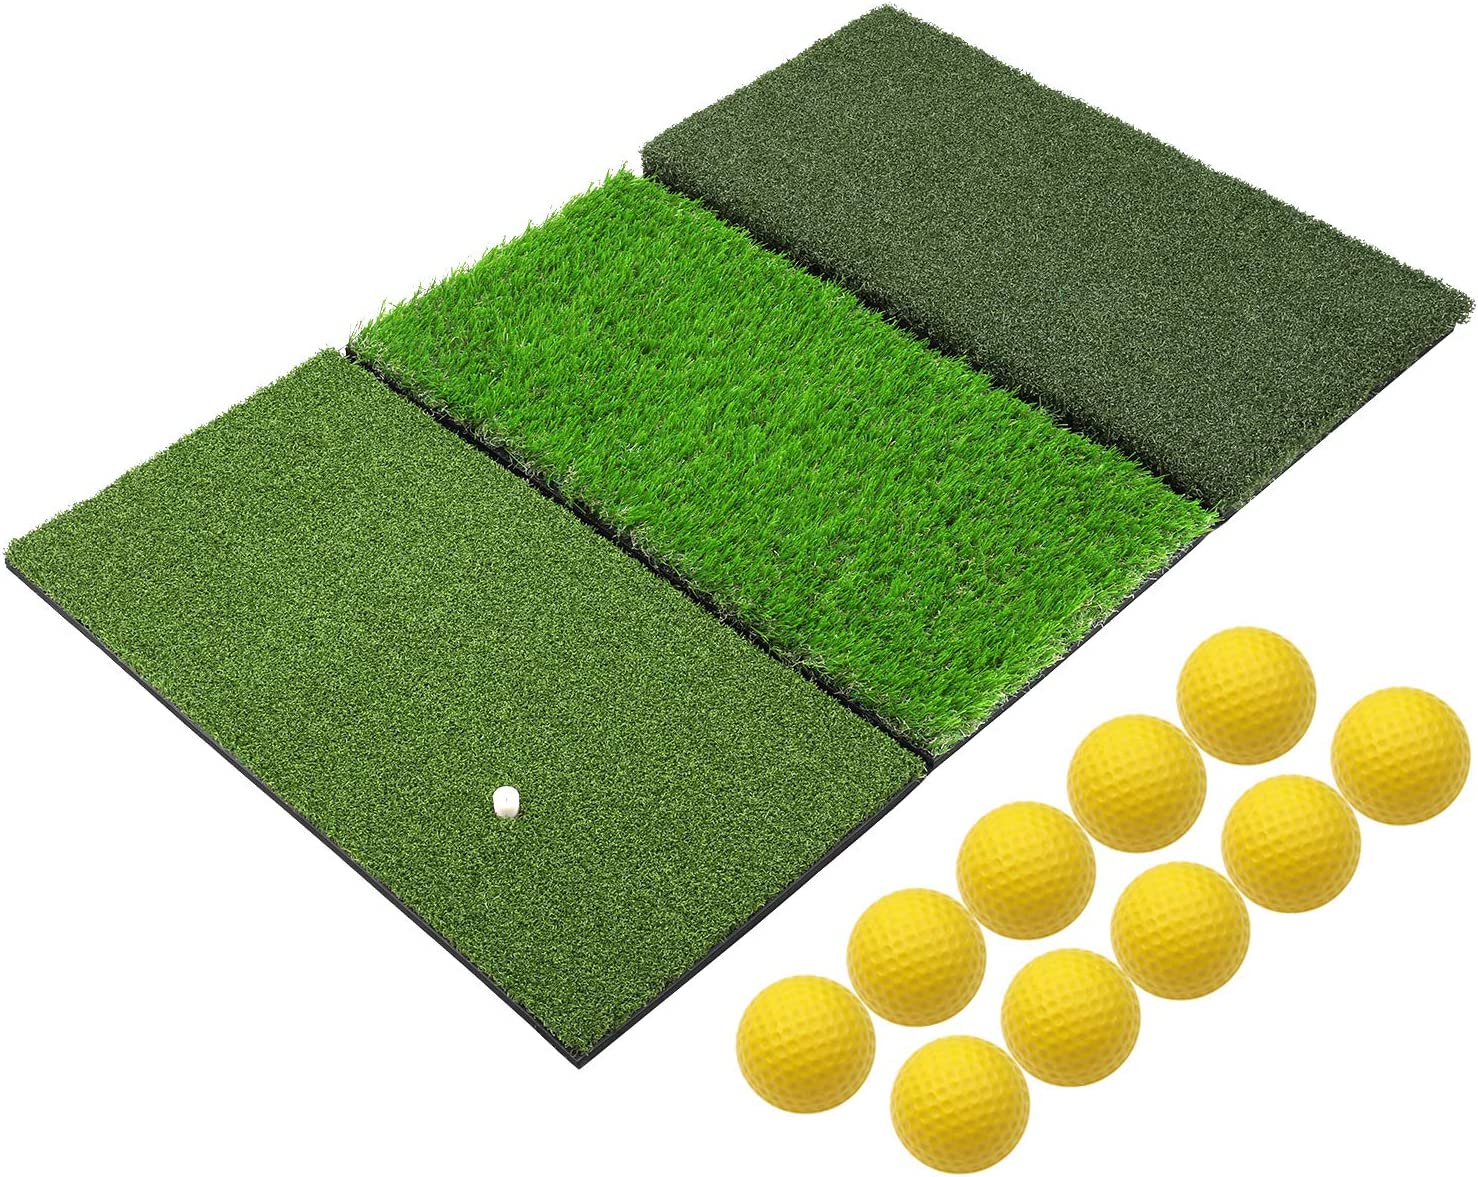 SkyLife 3-Turf Golf Hitting Grass Mat, Portable Training Fairway Rough TEE Turf, Driving Chipping Putting Golf Equipment, Home Backyard Garage Outdoor Practice